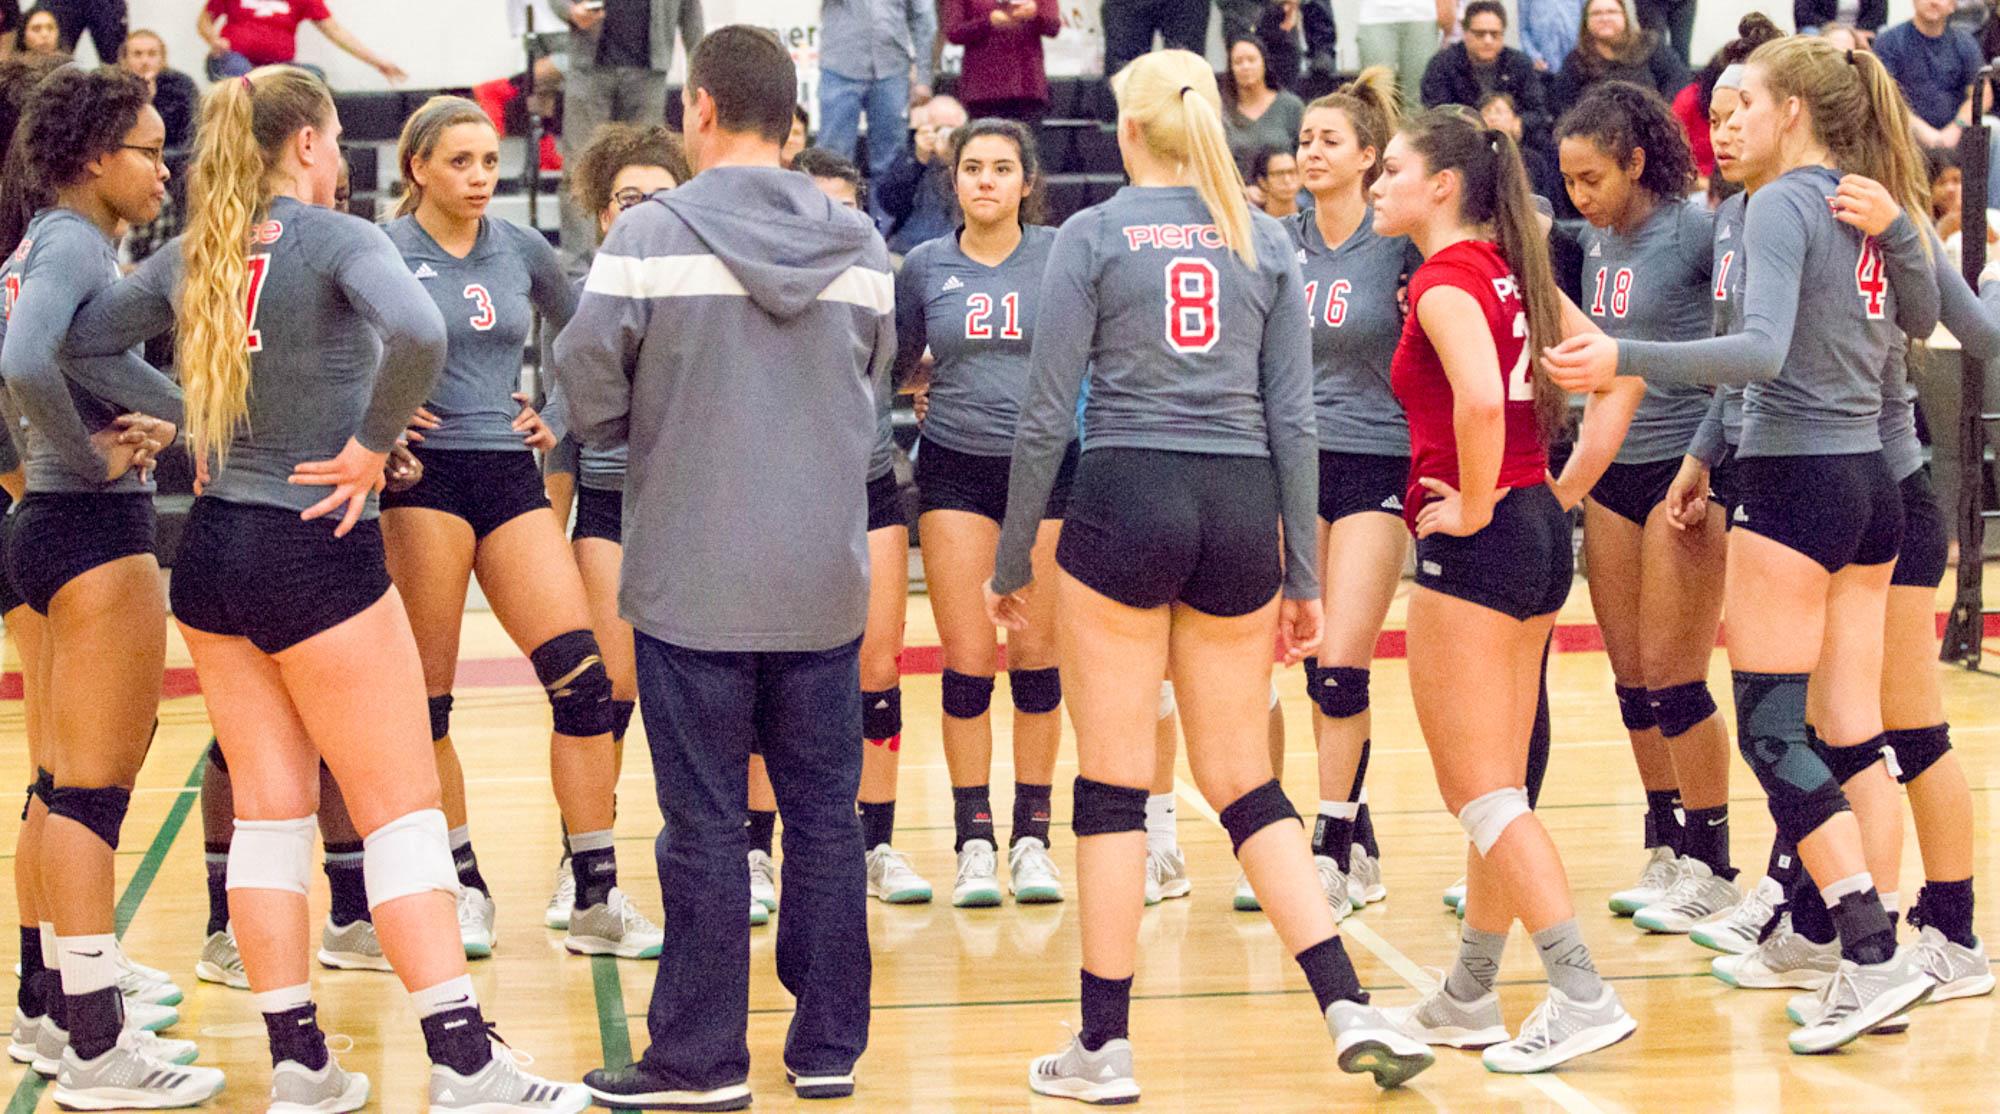 Knightfall for women's volleyball